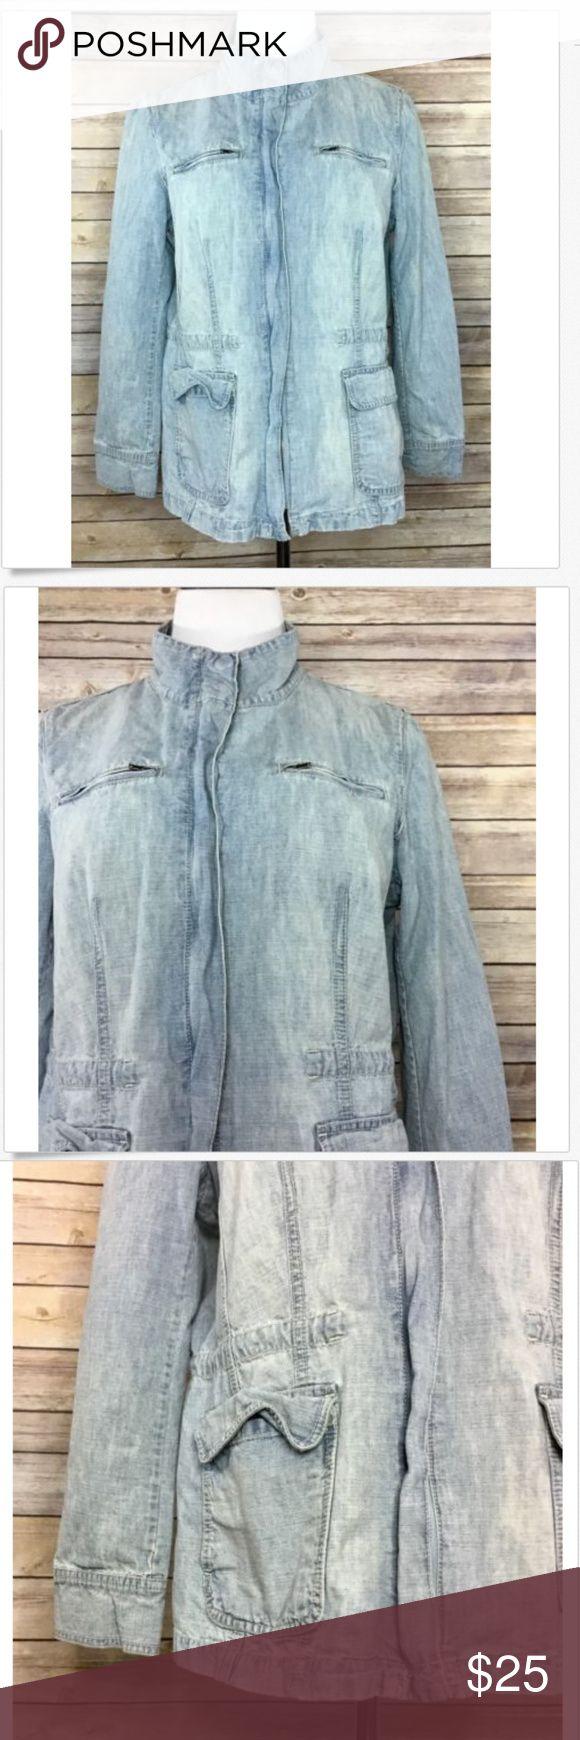 "J. Jill Womens Zip Up Light Wash Jean Jacket H8 J. Jill Women's Zip Up Light Wash Jean Jacket. EUC without flaws. Size Medium Petite. 100% Cotton. Length - 24.5"" Chest - 41"" Waist - 39"" J. Jill Jackets & Coats Jean Jackets"